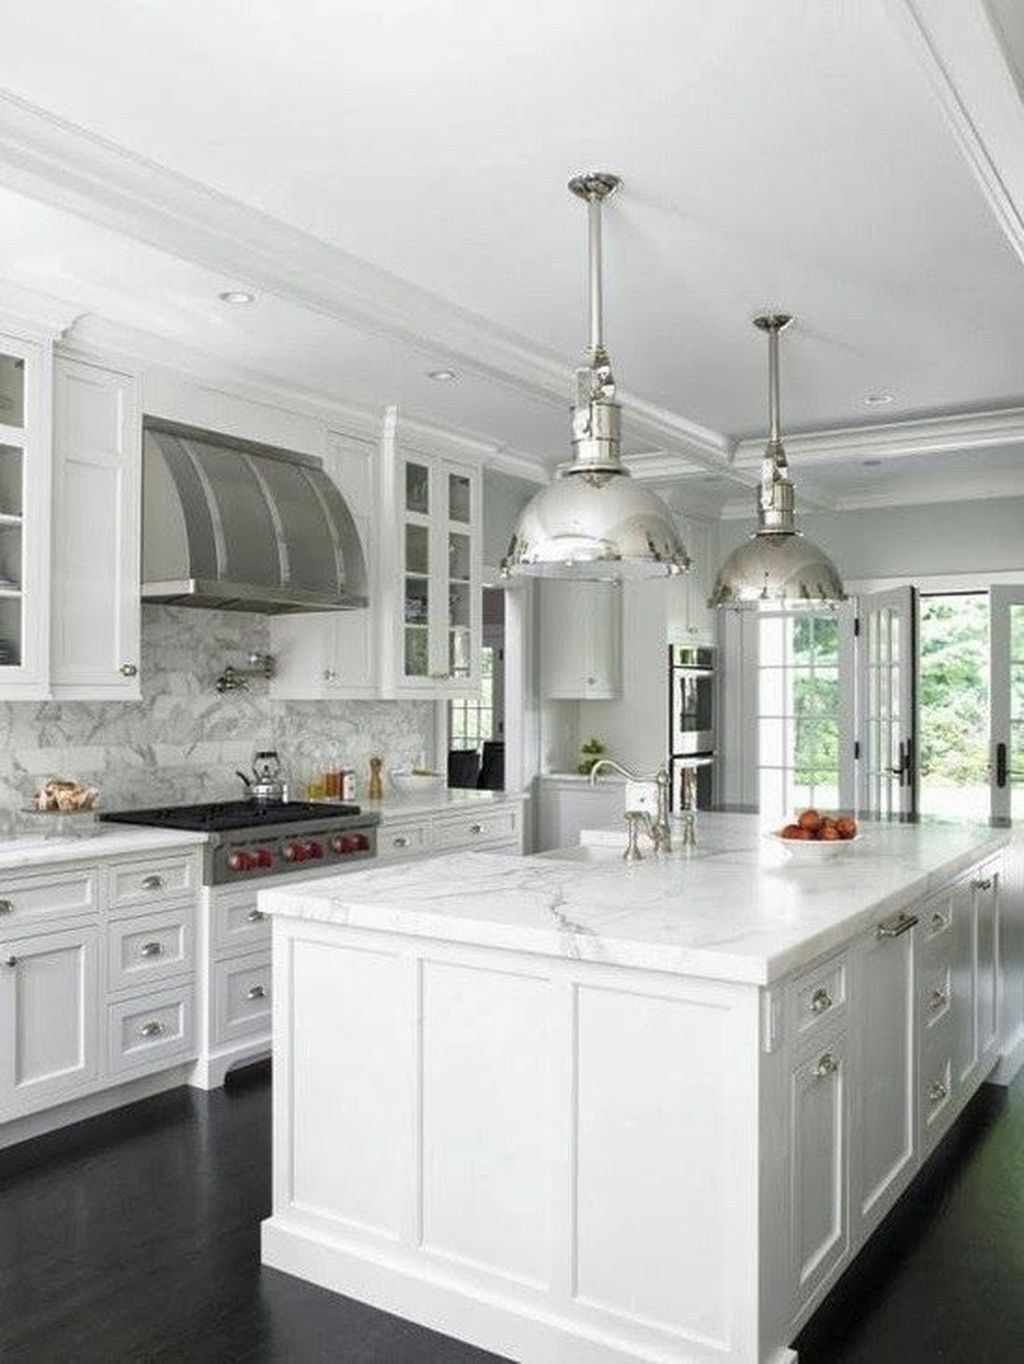 46 luxury white kitchen design ideas to get elegant look kitchens kitchen interior white on kitchen ideas white id=98338